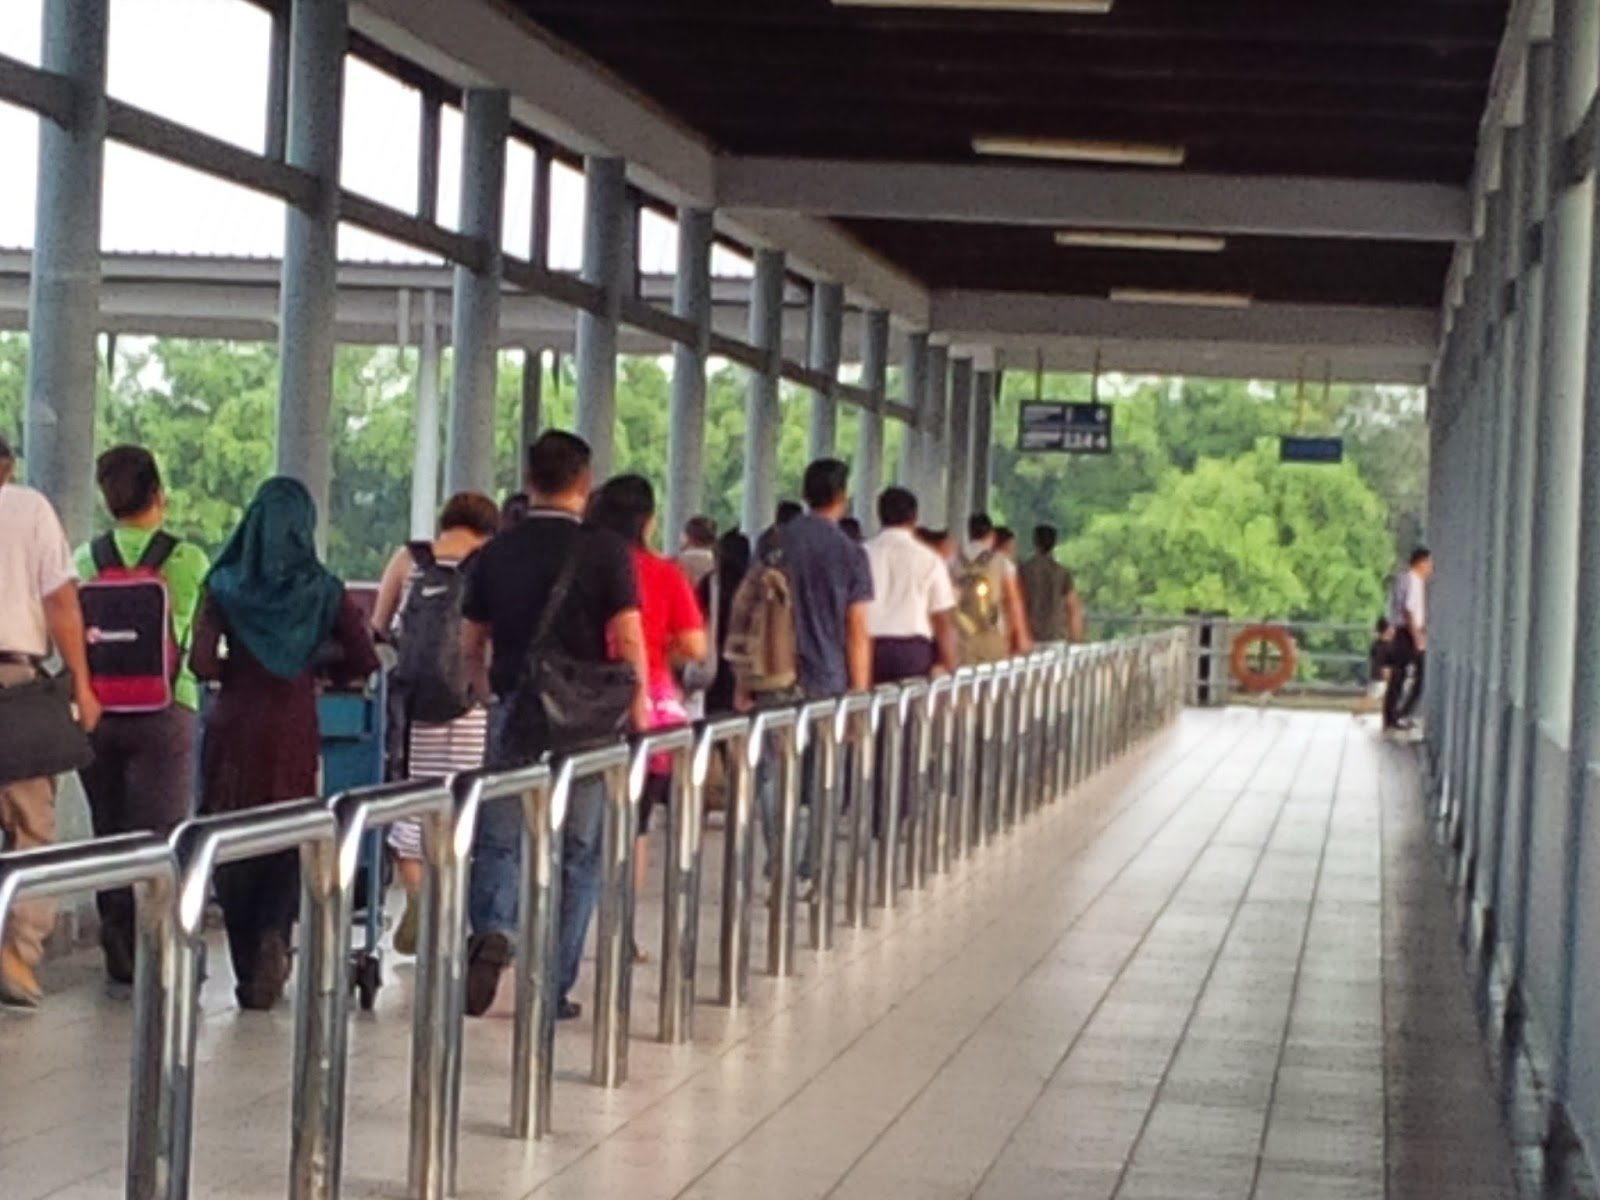 boat langkawi, ferry kuala perlis, ferry langkawi, ferry ride, ferry terminal, kuala kedah ferry terminal, tourism, travel